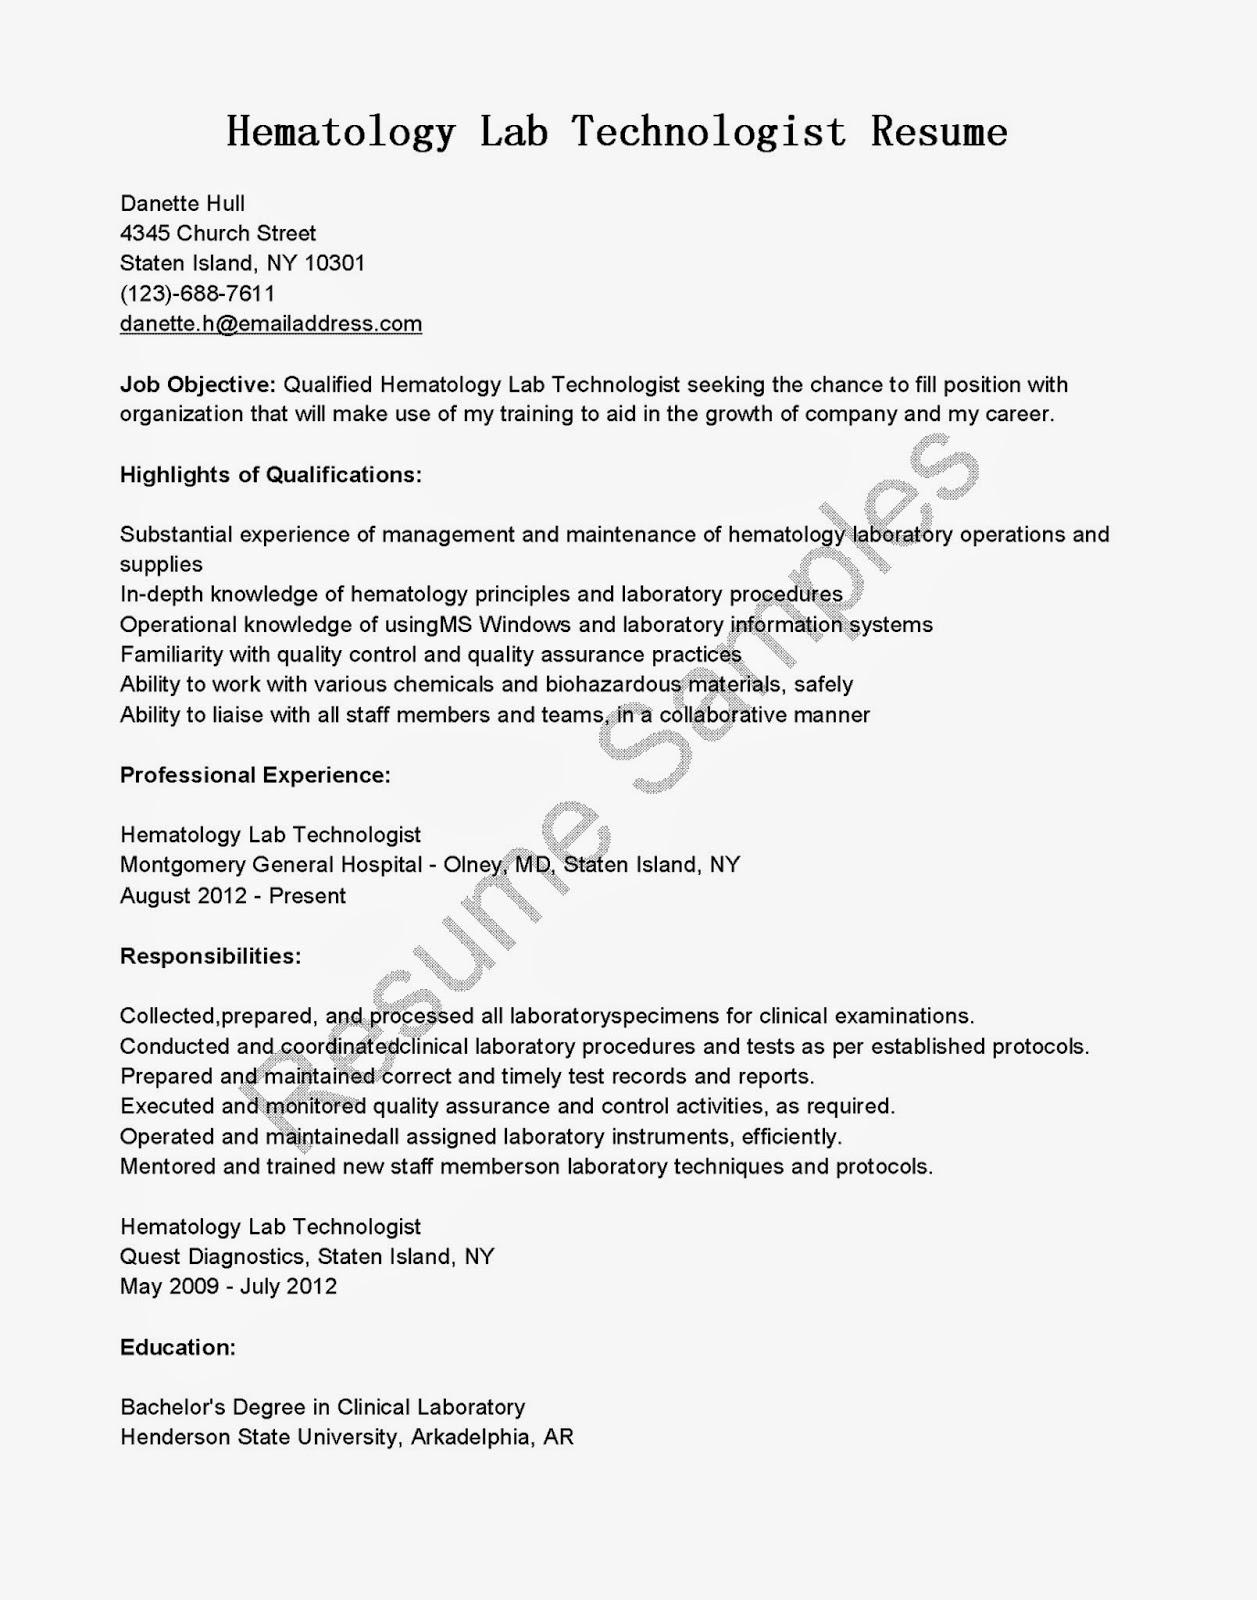 resume samples  hematology lab technologist resume sample